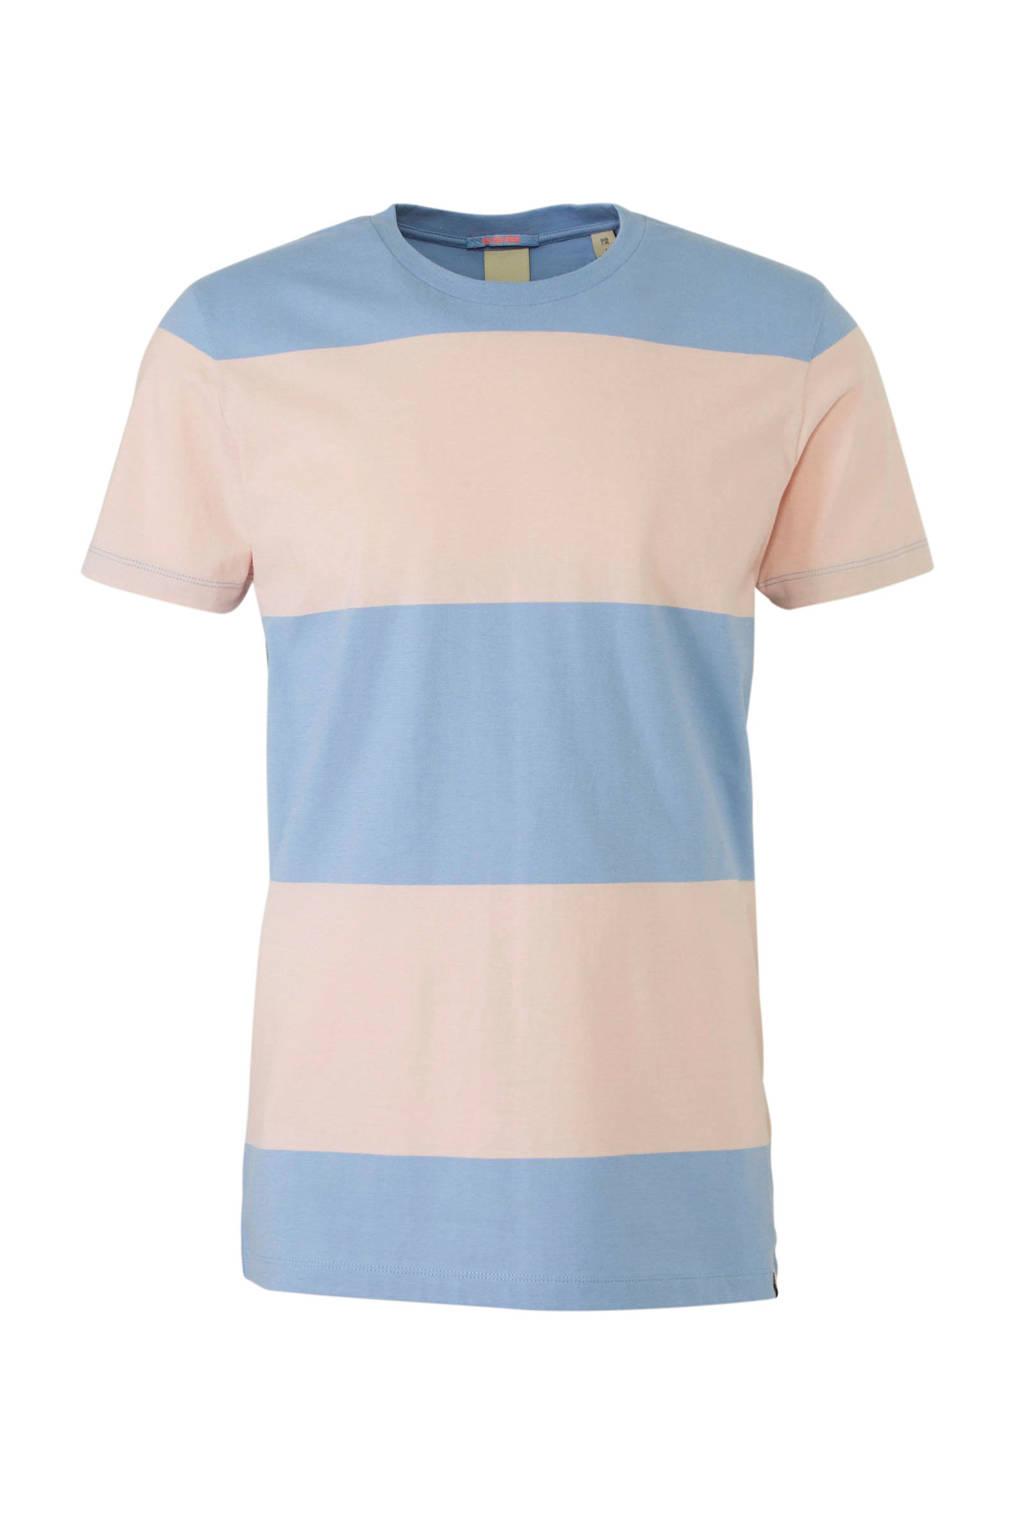 Scotch & Soda T-shirt, Lichtroze/lichtblauw